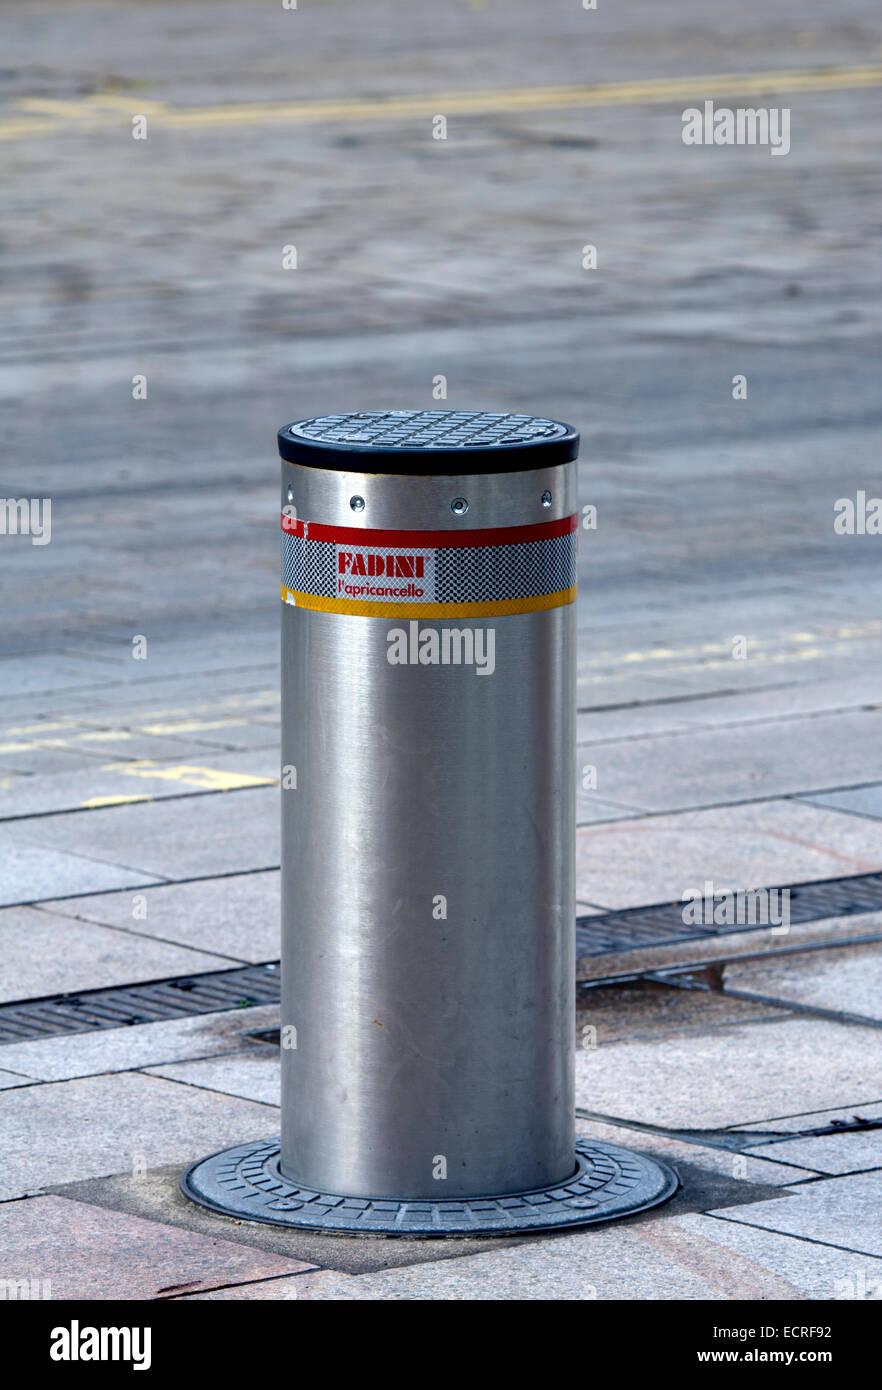 Retractable bollard, Stratford-upon-Avon, UK - Stock Image